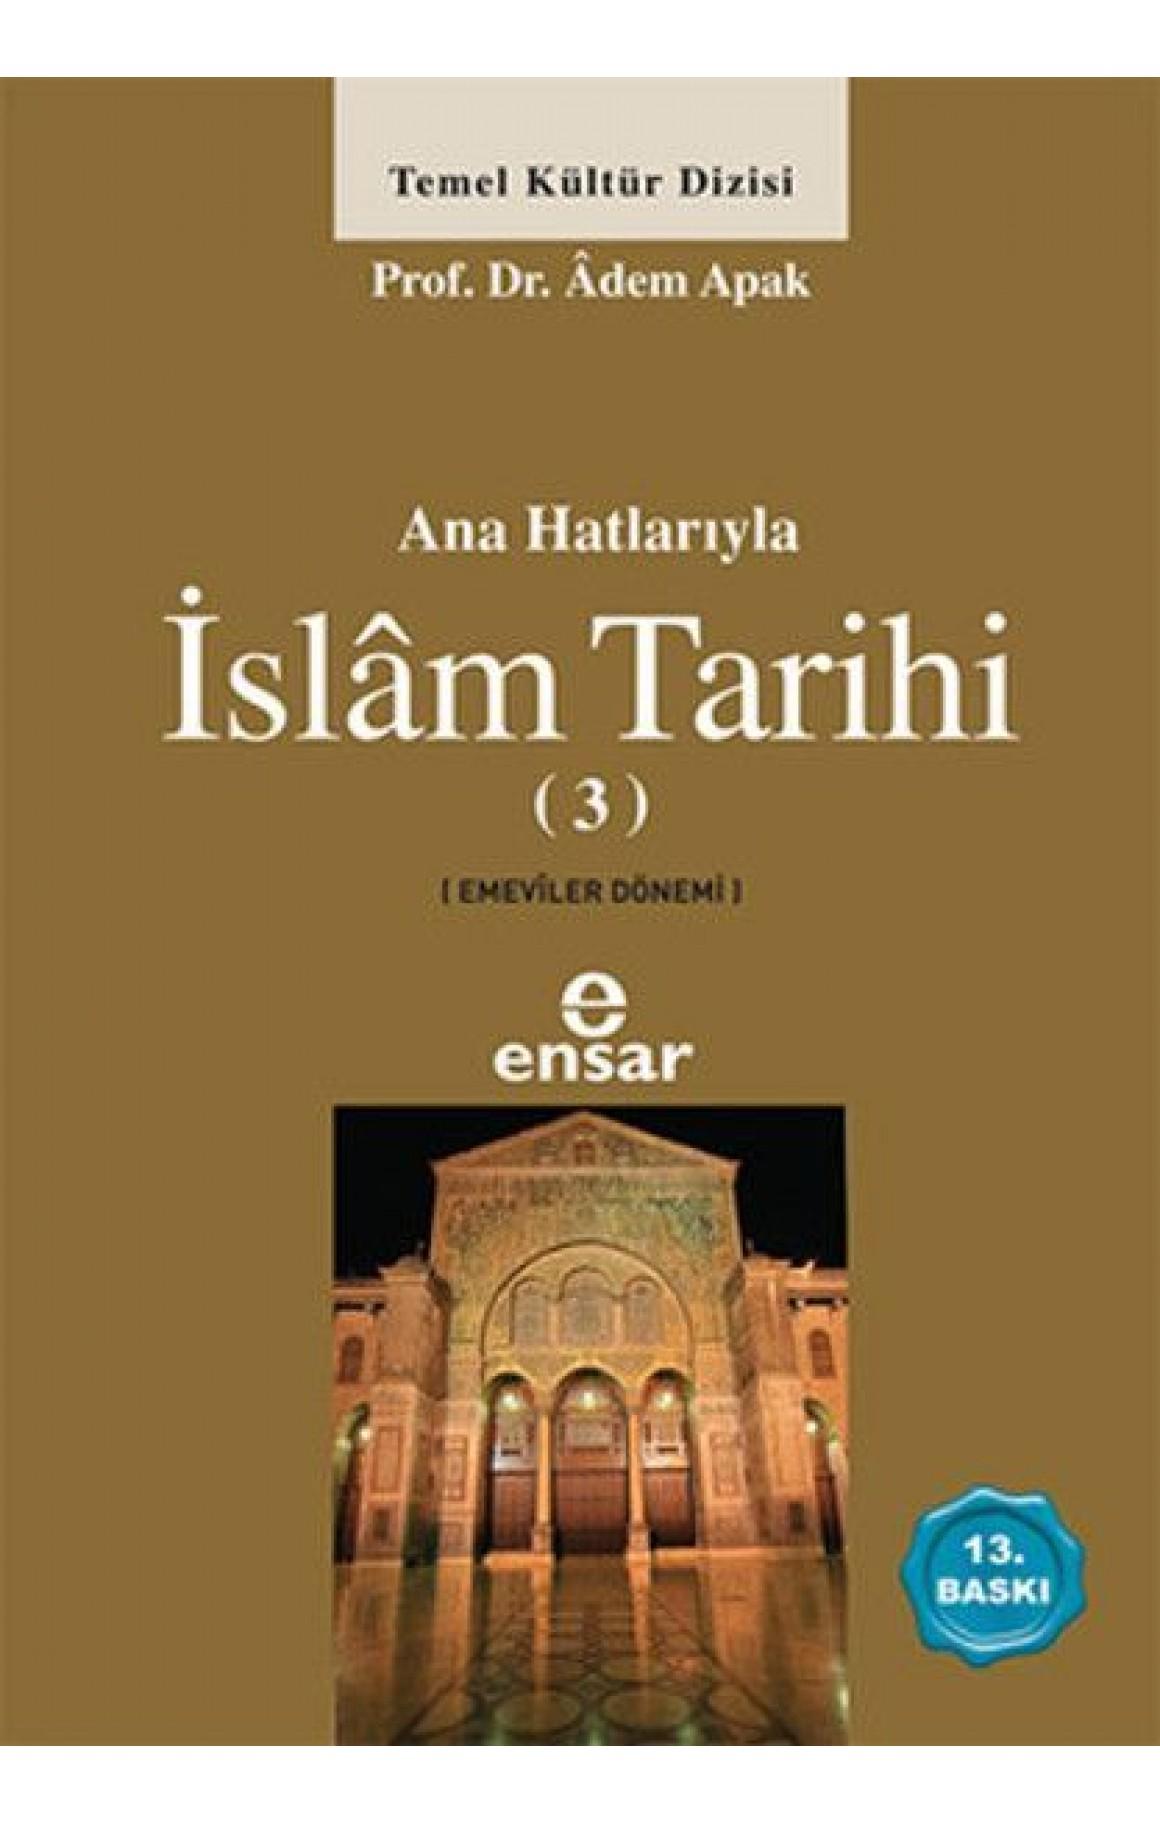 Anahatlariyla Islam Tarihi 3